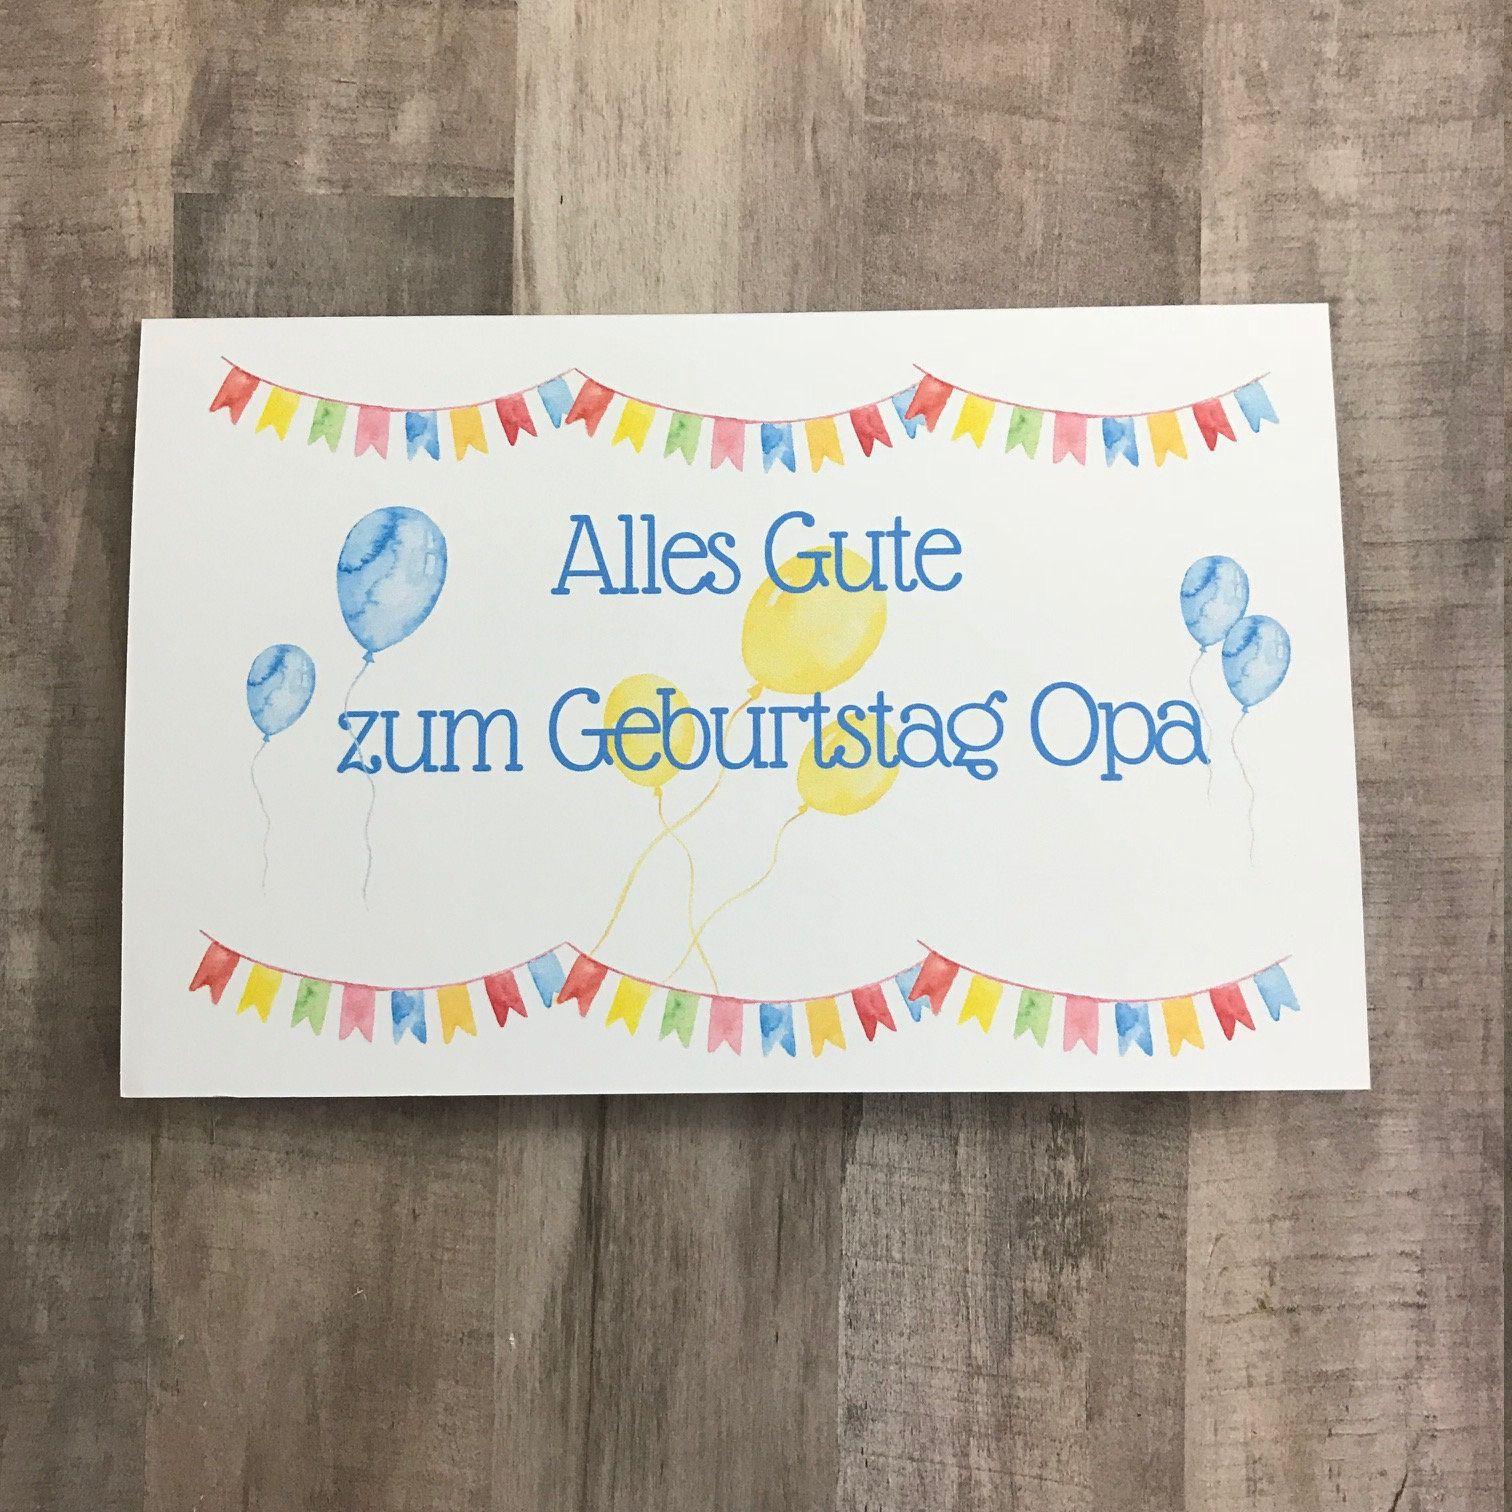 Alles Gute Zum Geburtstag Opa Printable Birthday Card For Etsy In 2021 Happy Birthday Cards Diy Birthday Cards Diy Birthday Card Printable